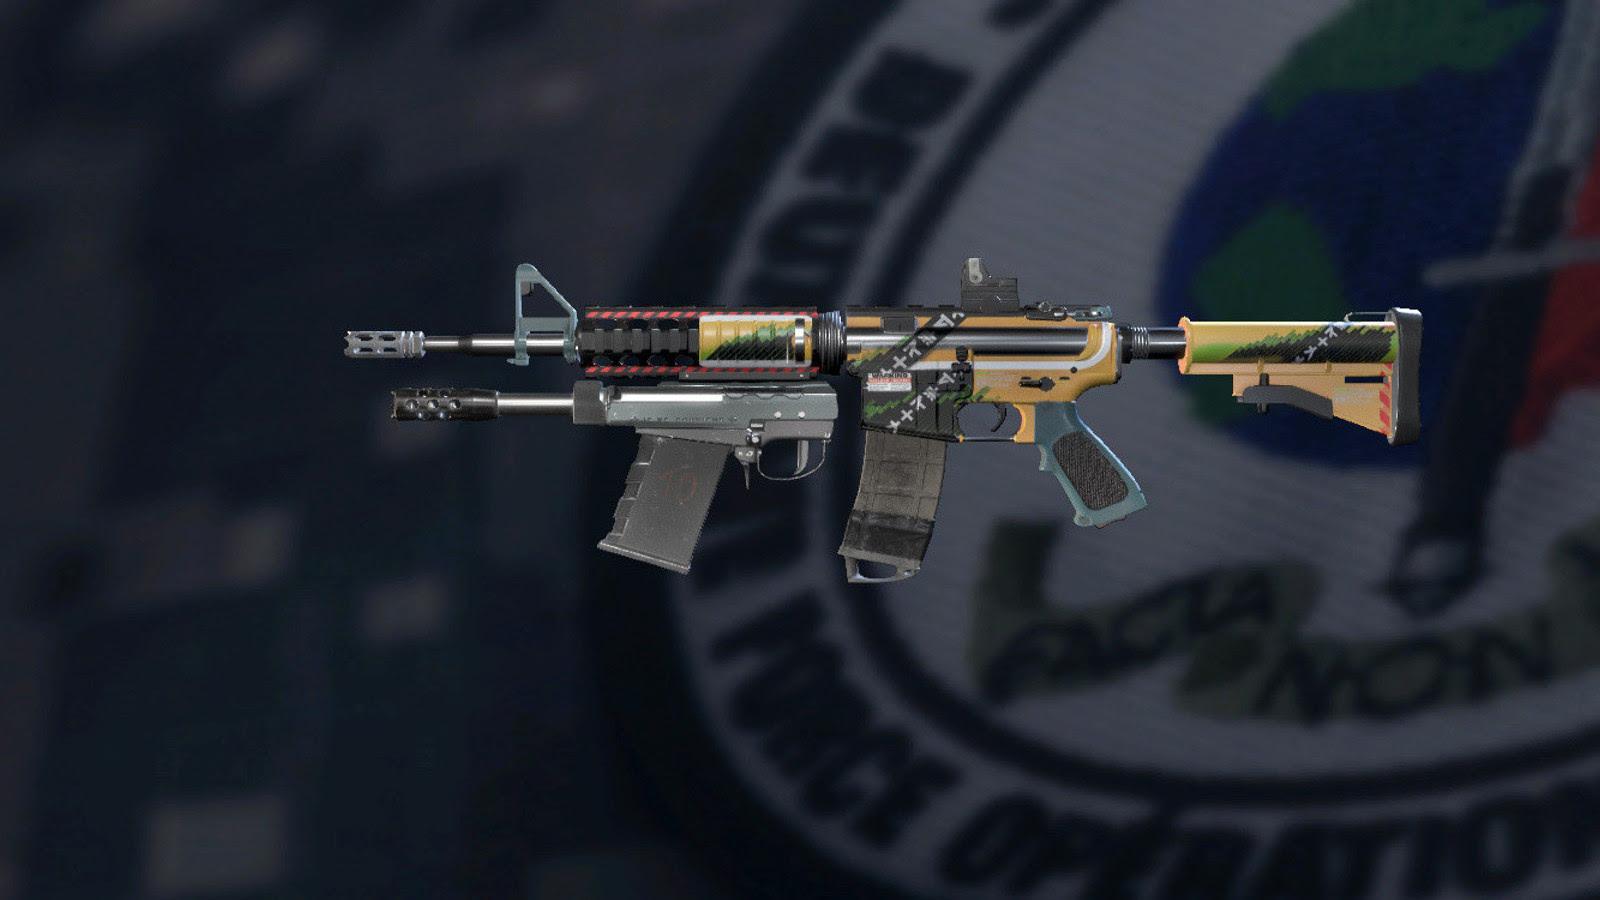 Mech Weapon Skin Rainbow Six Siege Rainbow Six Bootcamp